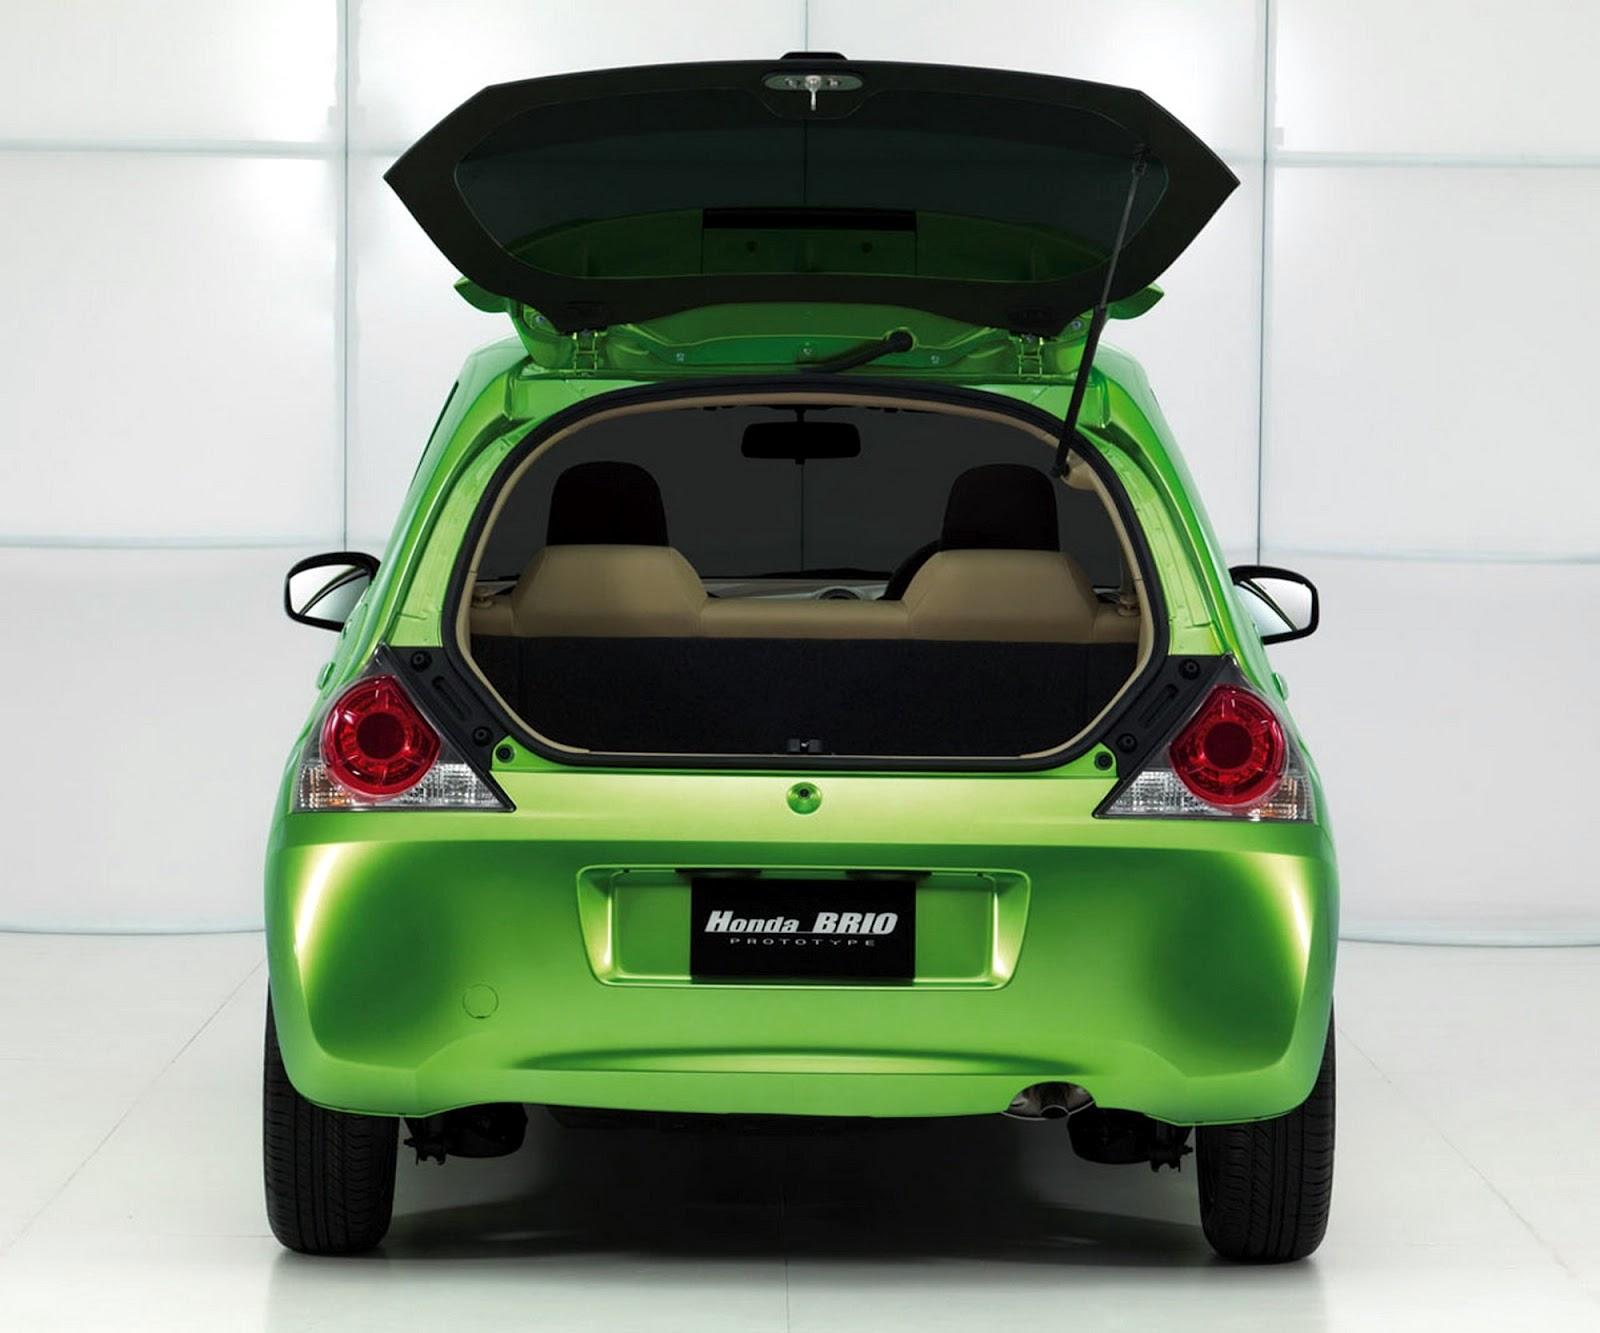 http://2.bp.blogspot.com/-zhd_fIUC_68/T3xolKl1xlI/AAAAAAAAAEk/5gOMSZngy_8/s1600/2010+Honda+Brio+%25284%2529.jpg